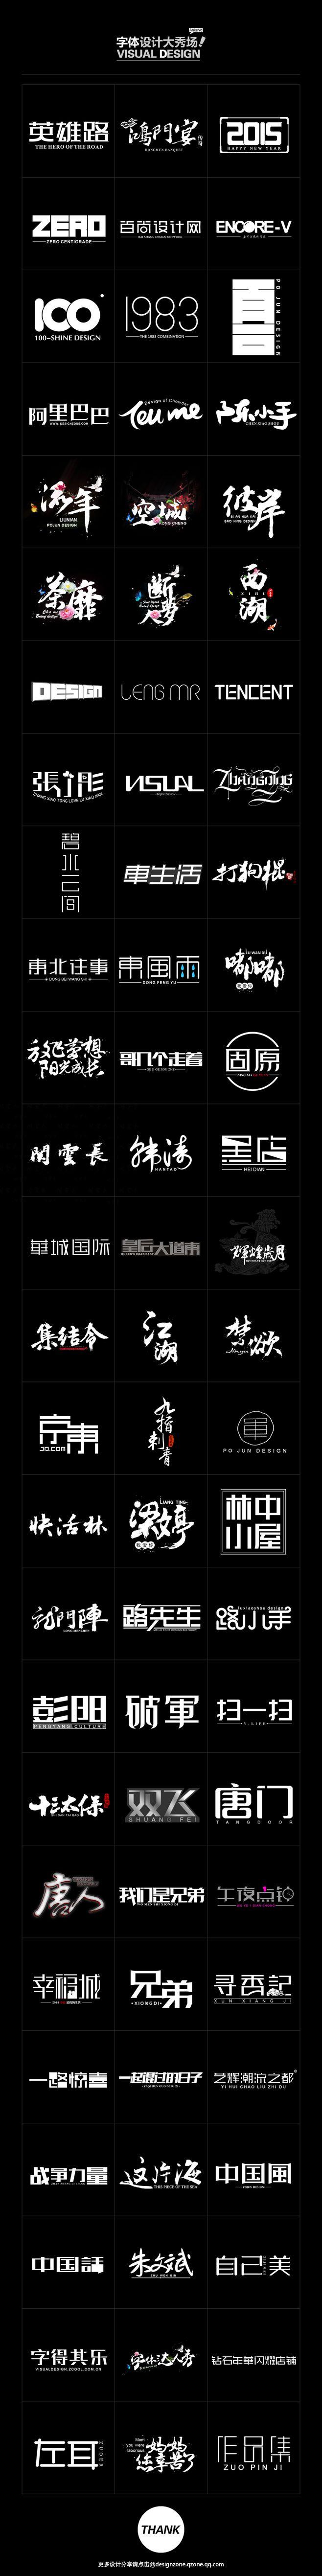 www.ziticq.com 字体传奇网...